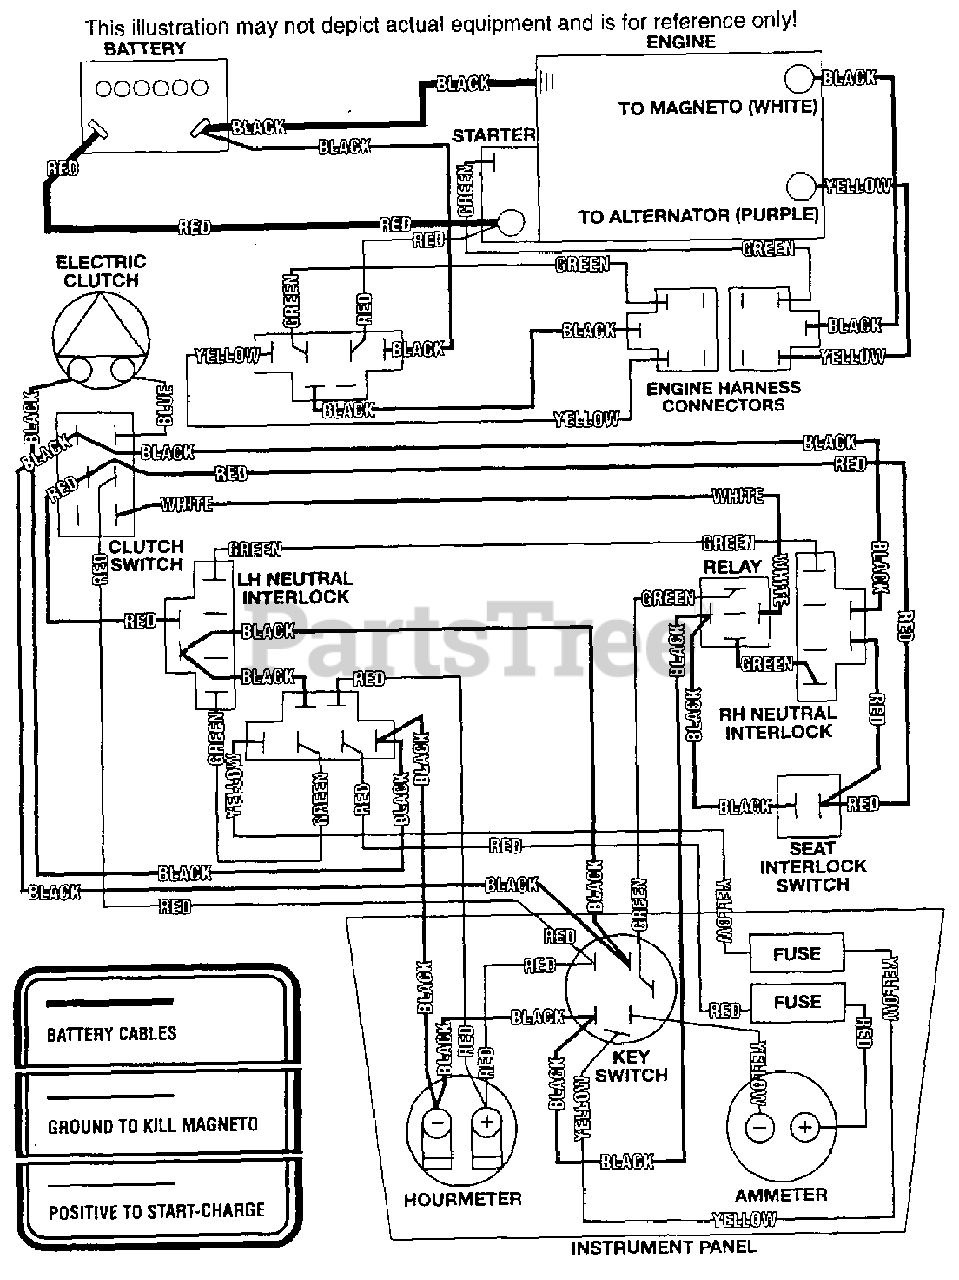 Scag Wiring Diagram - Diagram Design Sources cable-wires-lab - cable-wires -lab.lesmalinspres.fr | Turf Tiger Pto Switch Wiring Diagram |  | cable-wires-lab.lesmalinspres.fr